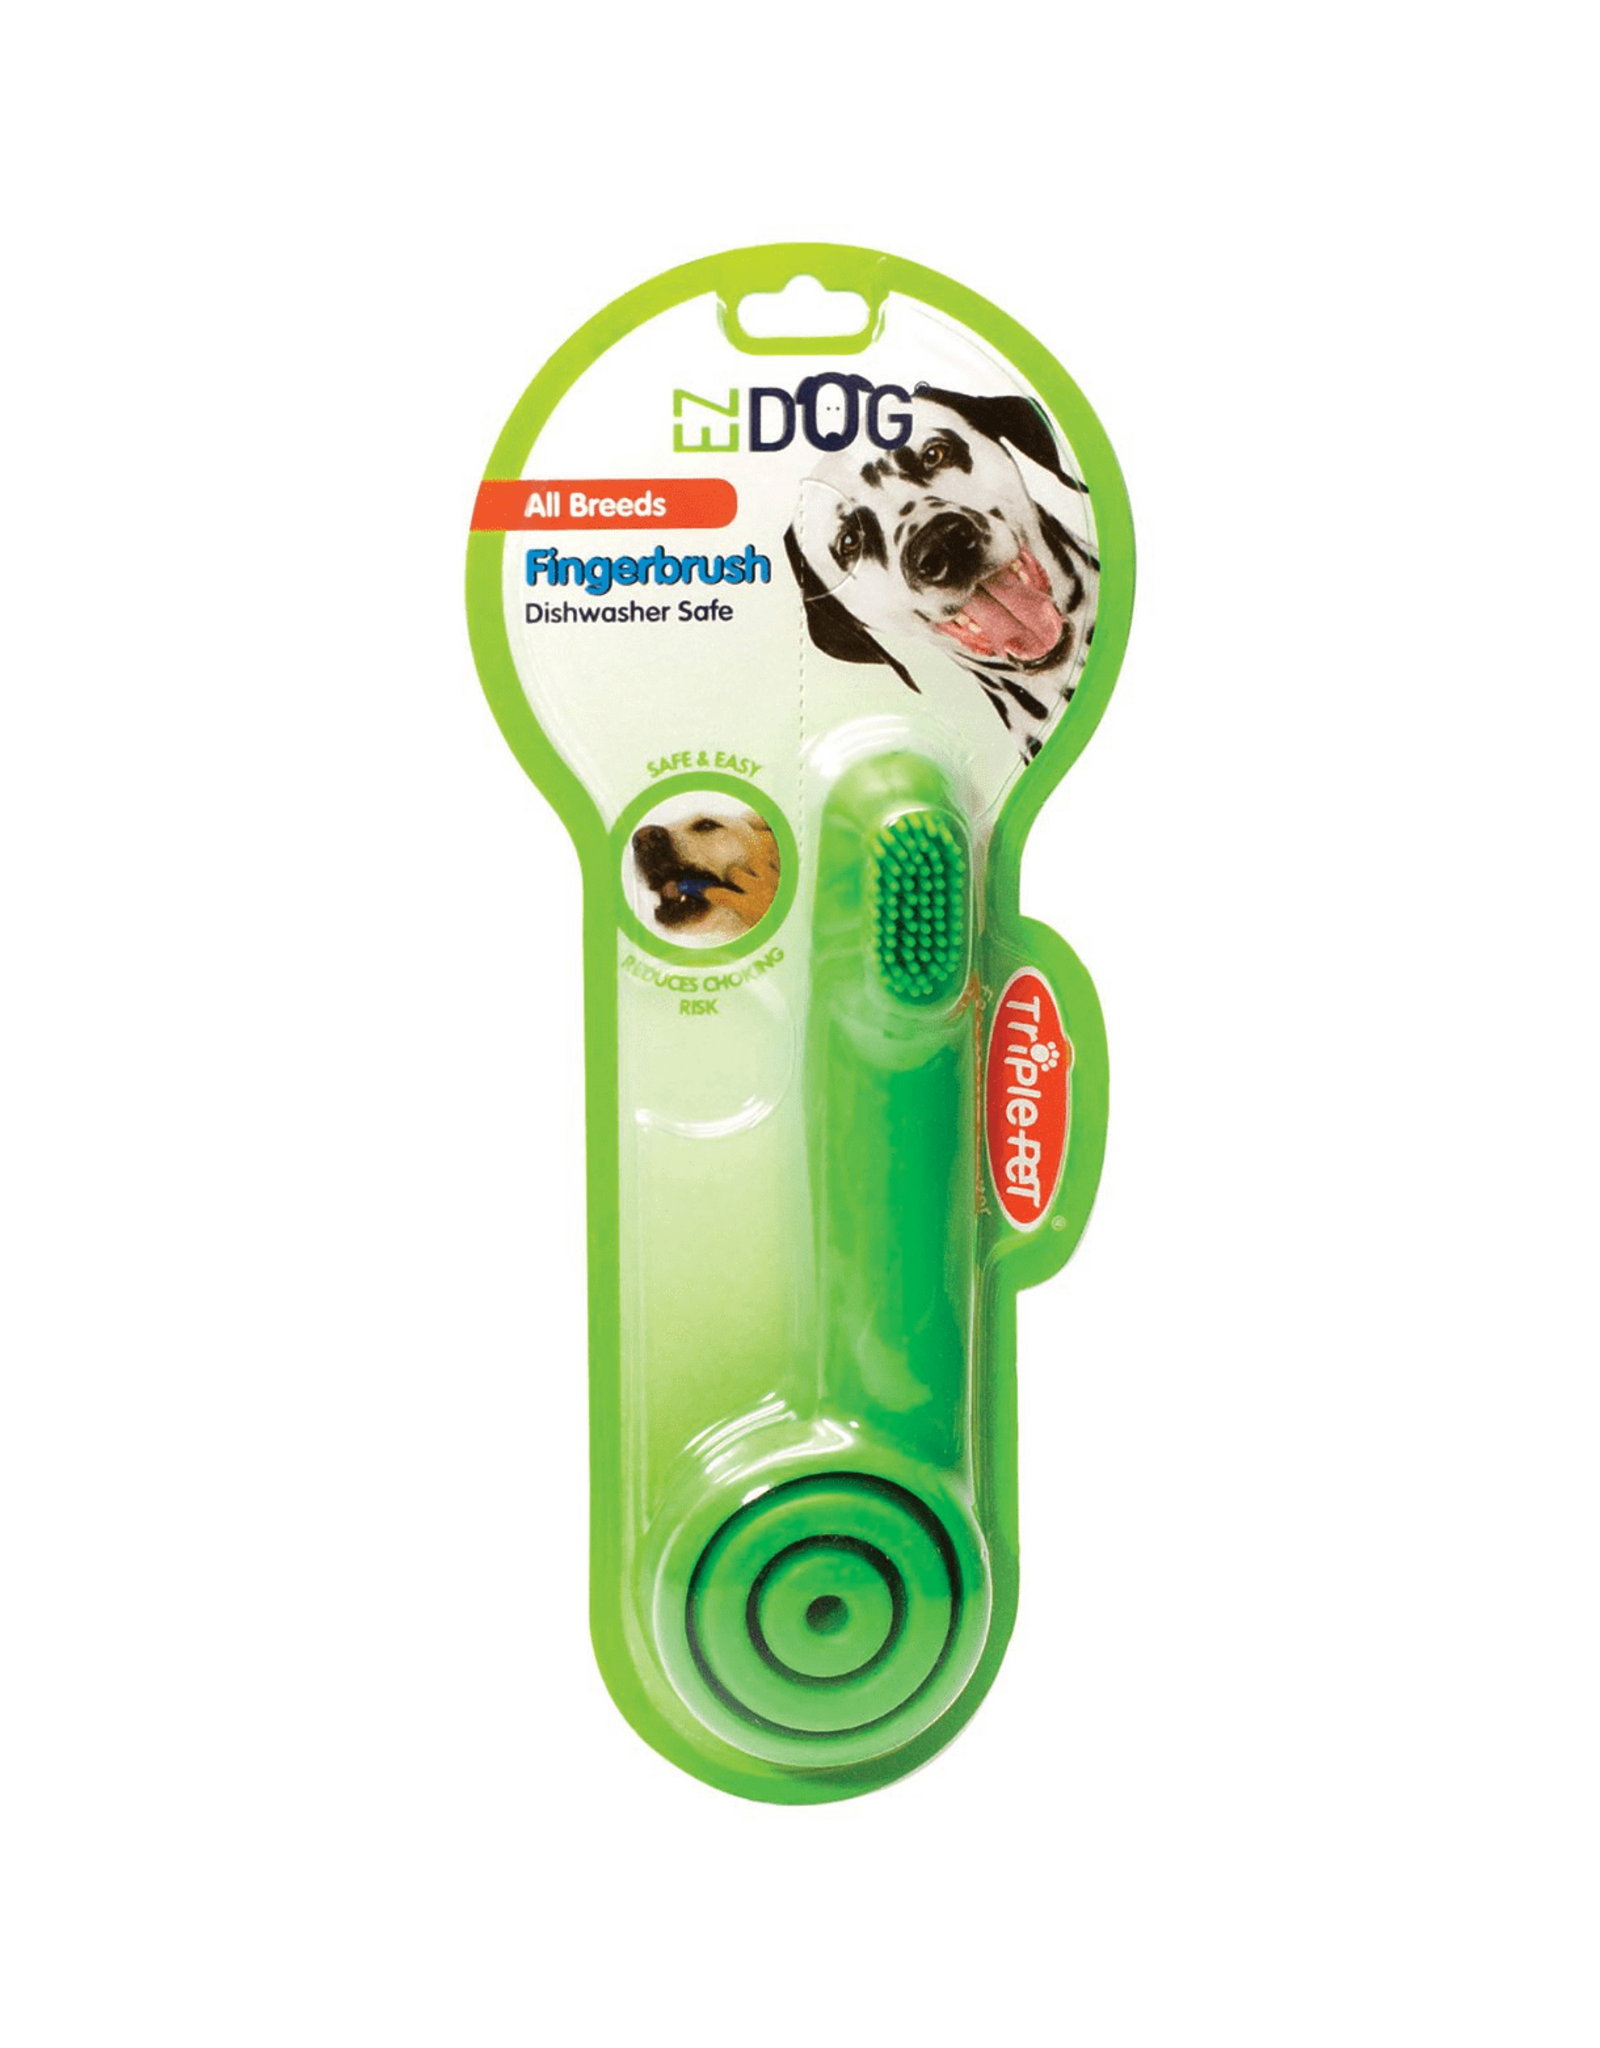 Triple Pet Triple Pet EZ Dog Pet Toothbrush- Fingerbrush, Small Breed, Large Breed